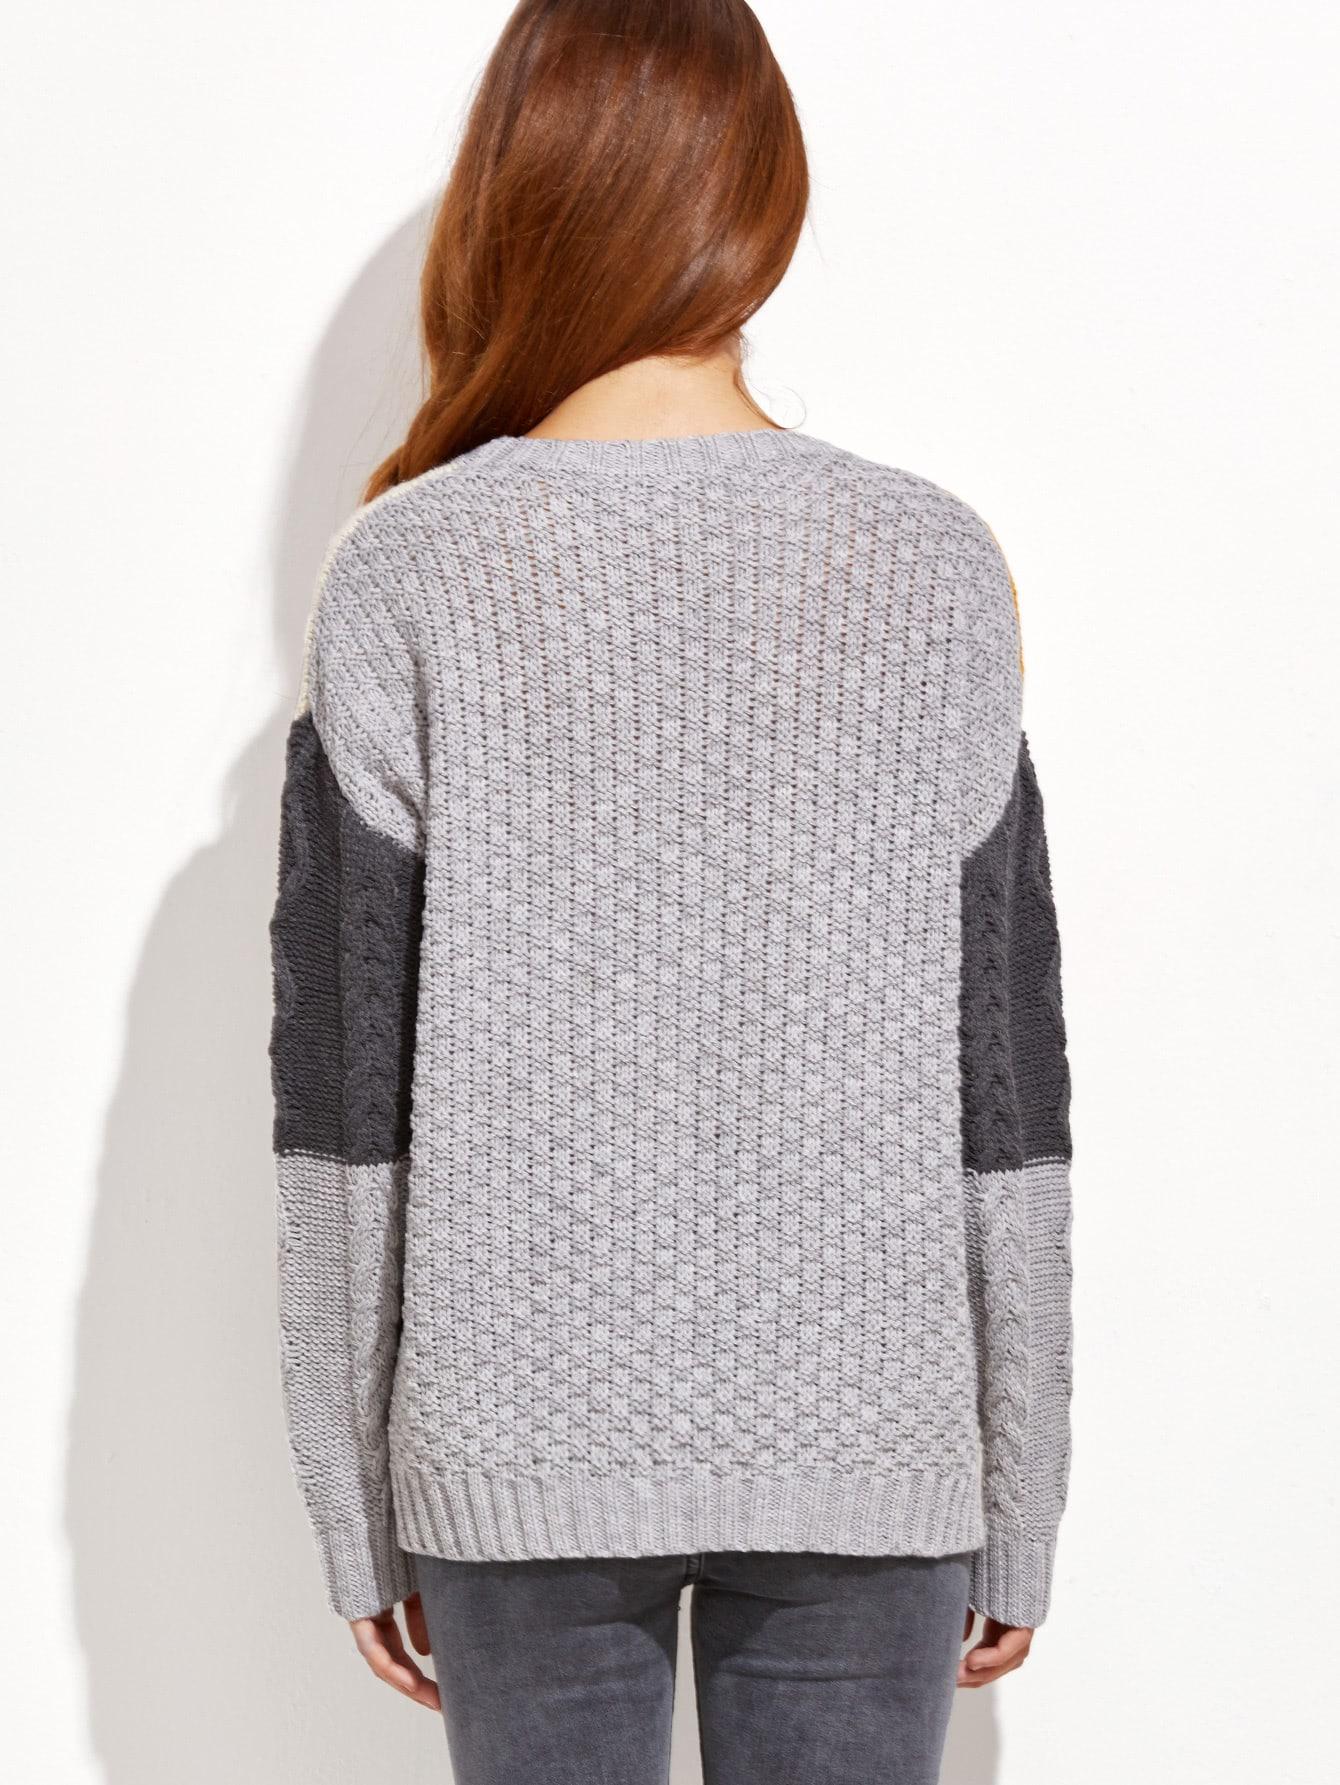 sweater160930456_2